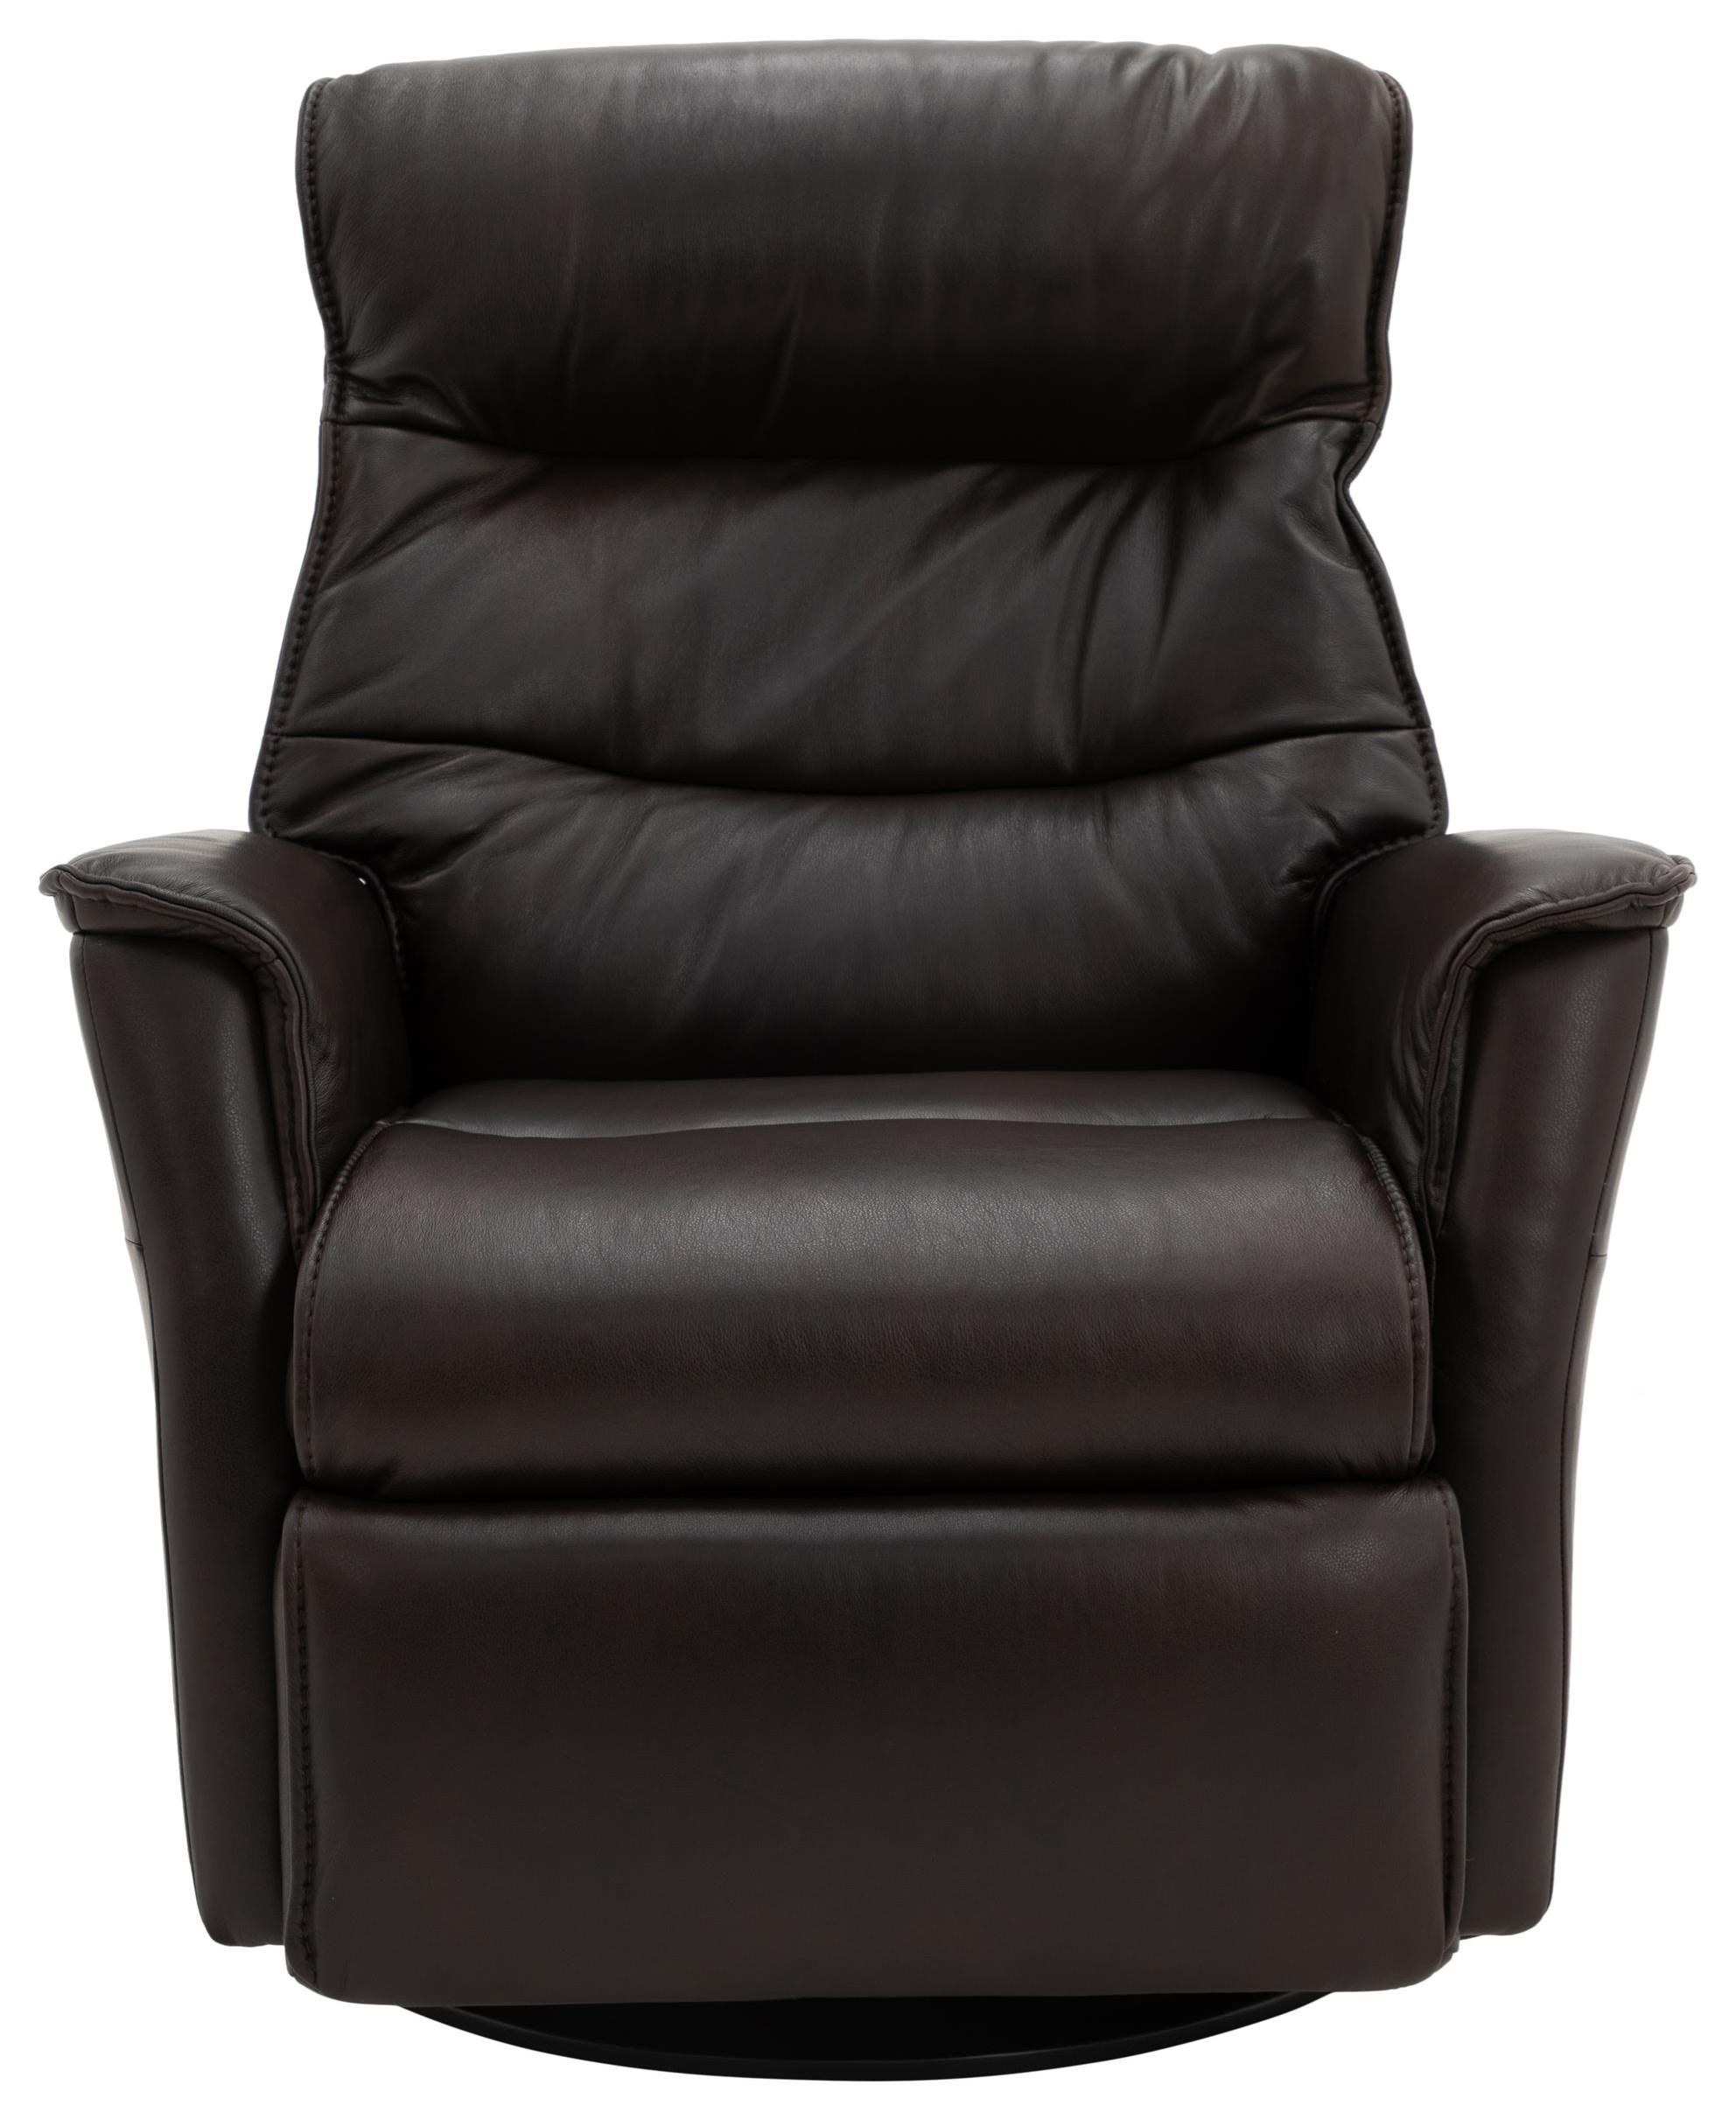 PARAMOUNT DARK BROWN LEATHER LARGE POWER RECLINER by Norwegian Comfort at Walker's Furniture